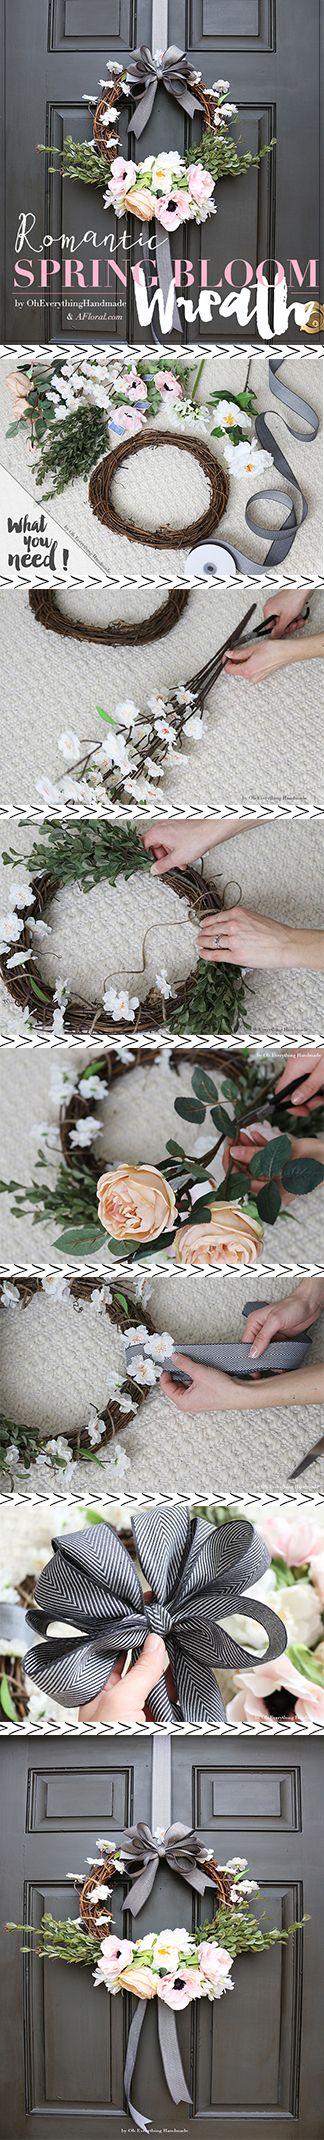 Romantic DIY Spring Bloom Wreath Tutorial via oh everything handmade